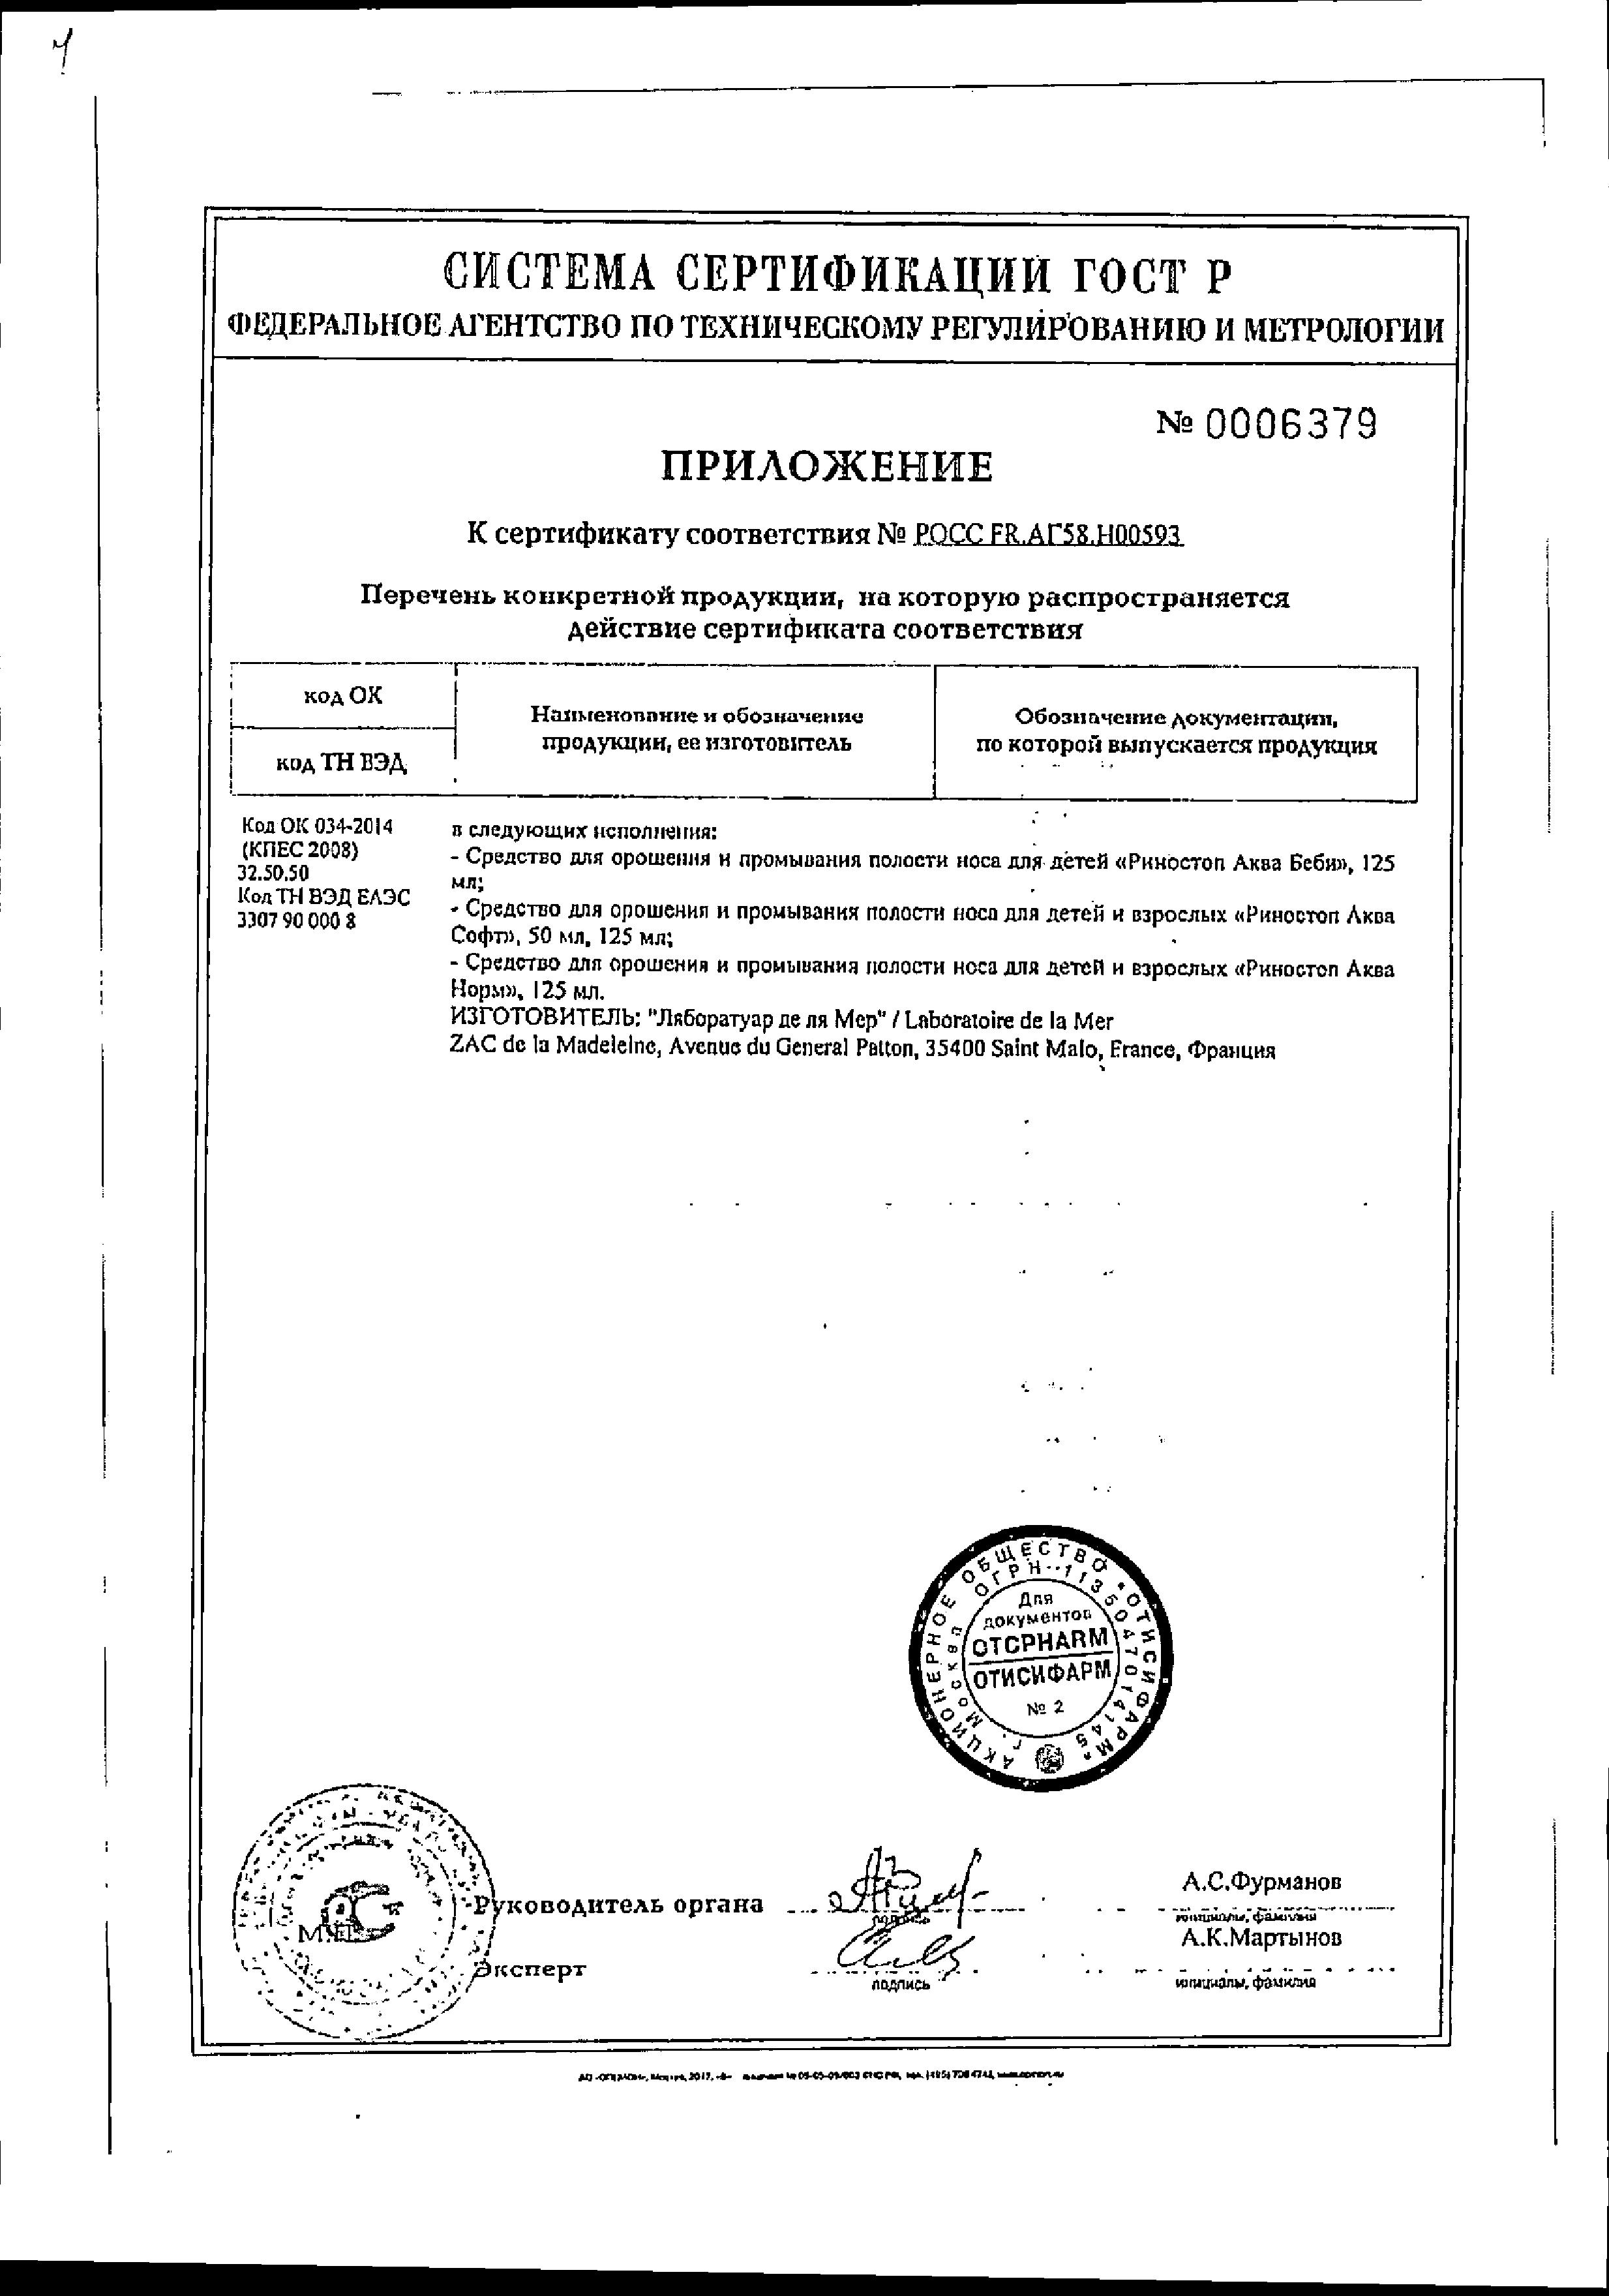 Риностоп Аква Беби сертификат